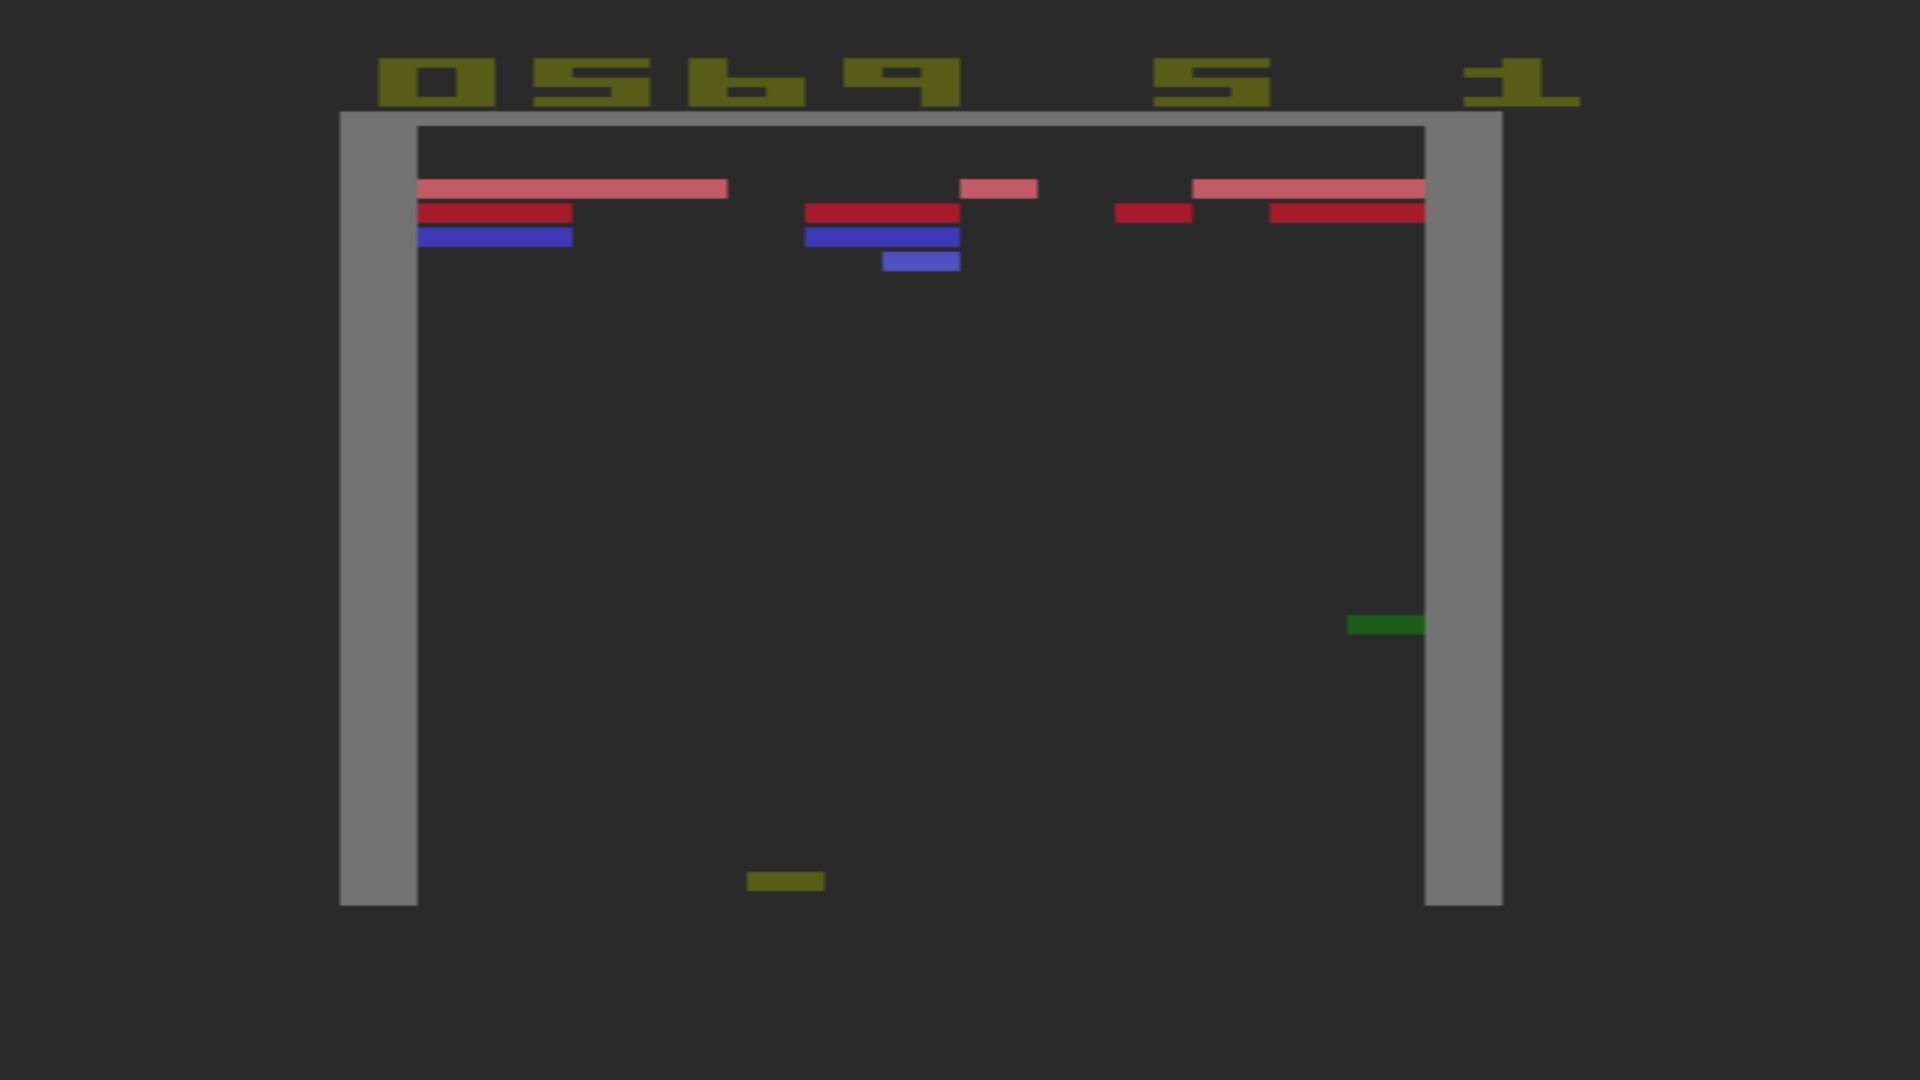 AkinNahtanoj: Super Breakout: Game 7 (Atari 2600 Emulated Novice/B Mode) 569 points on 2020-10-17 11:03:13